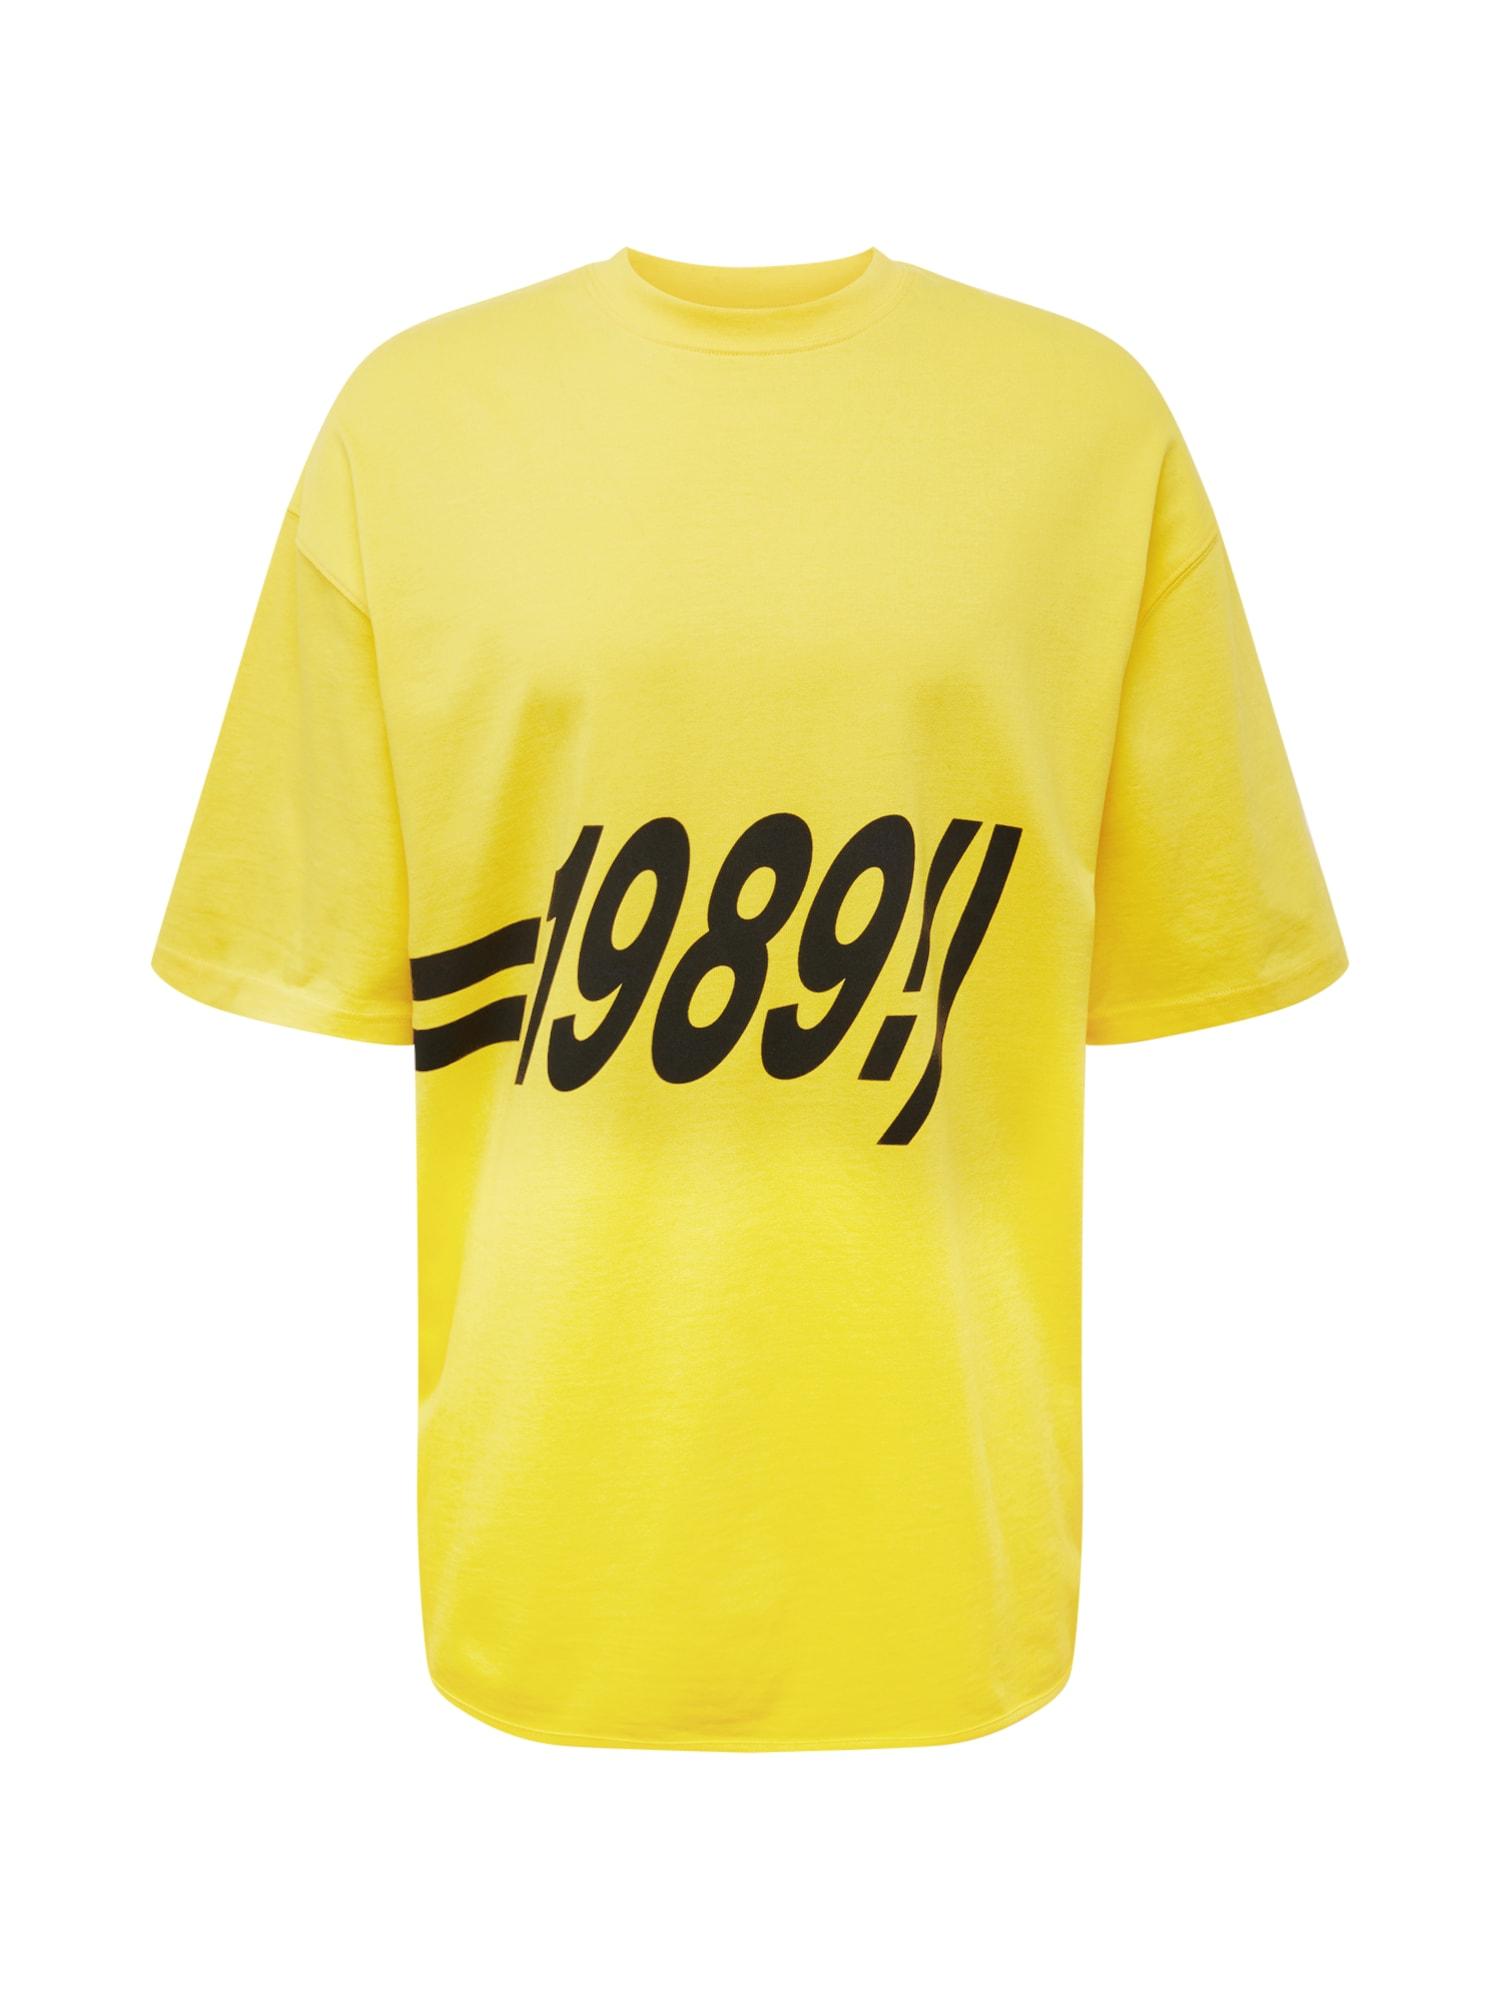 Tričko Tshirt 1989 žlutá černá Magdeburg - Los Angeles